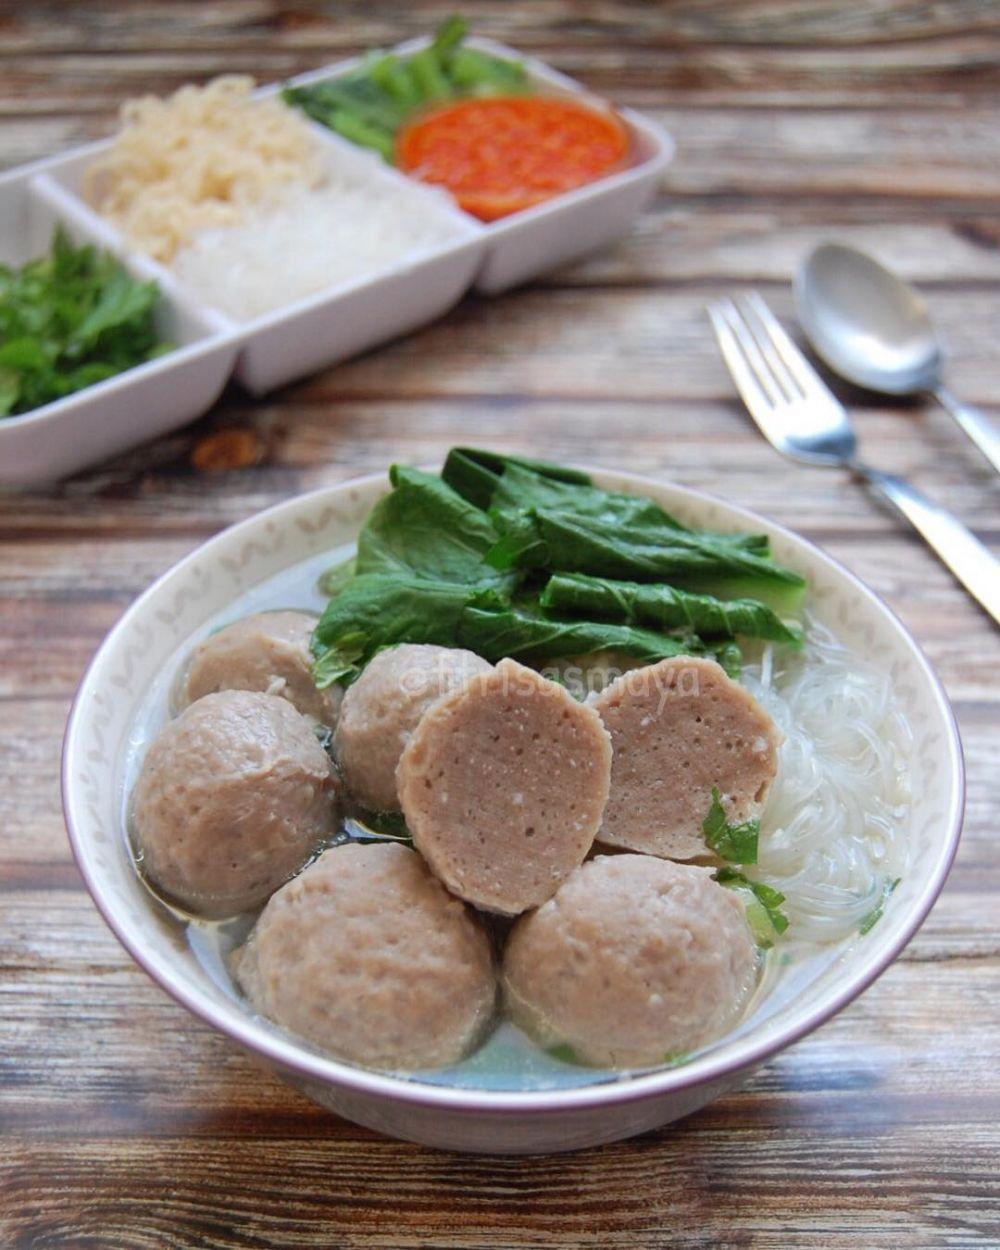 13 Resep Makanan Berkuah Enak Lezat Dinikmati Musim Hu